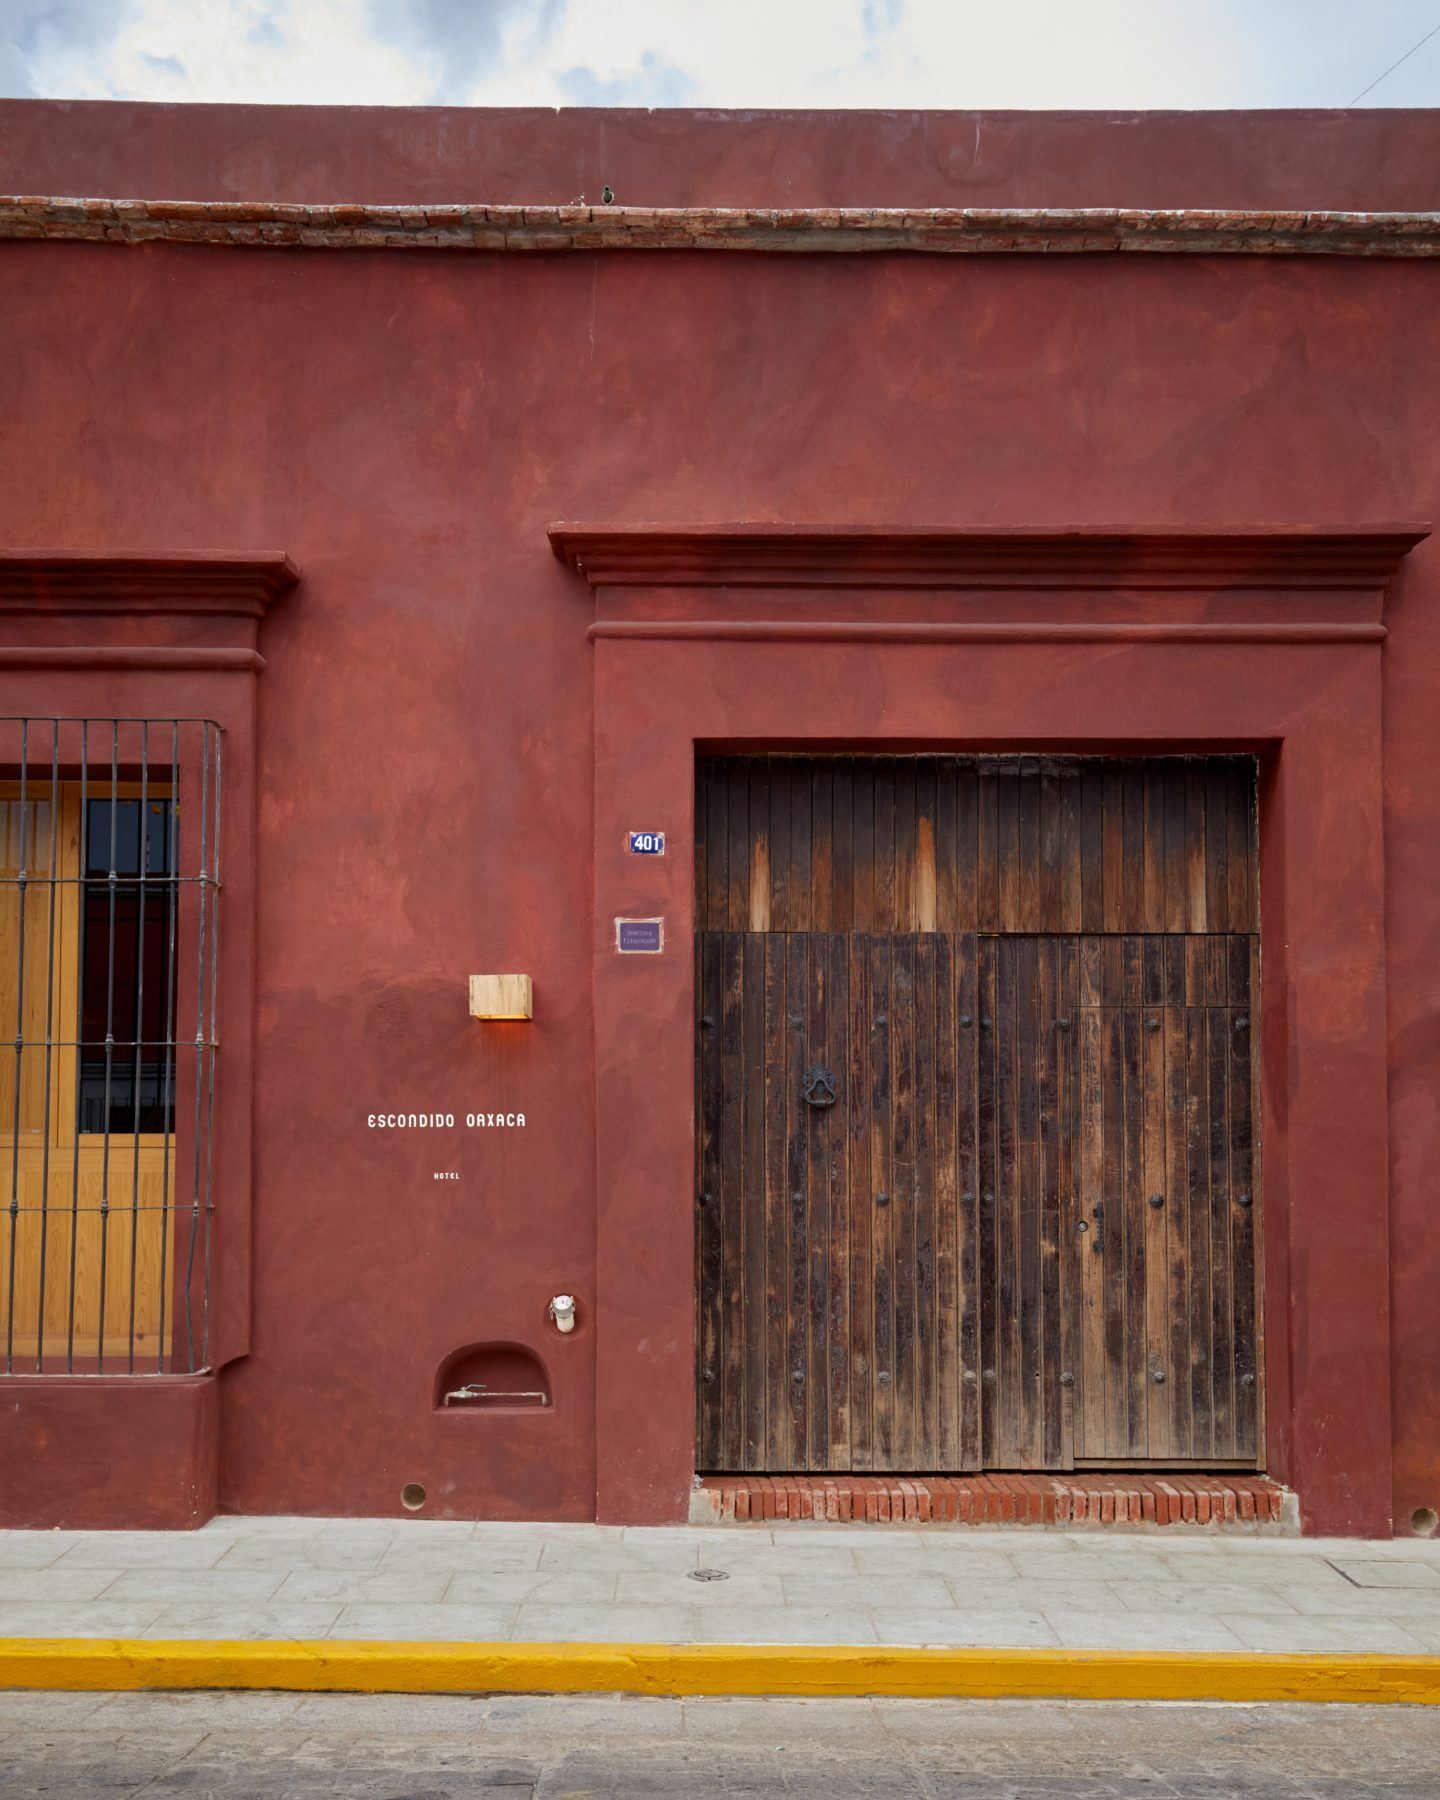 IGNANT-Travel-Sleep-EscondidoOaxacaHotel-SergioLopezFoto-1